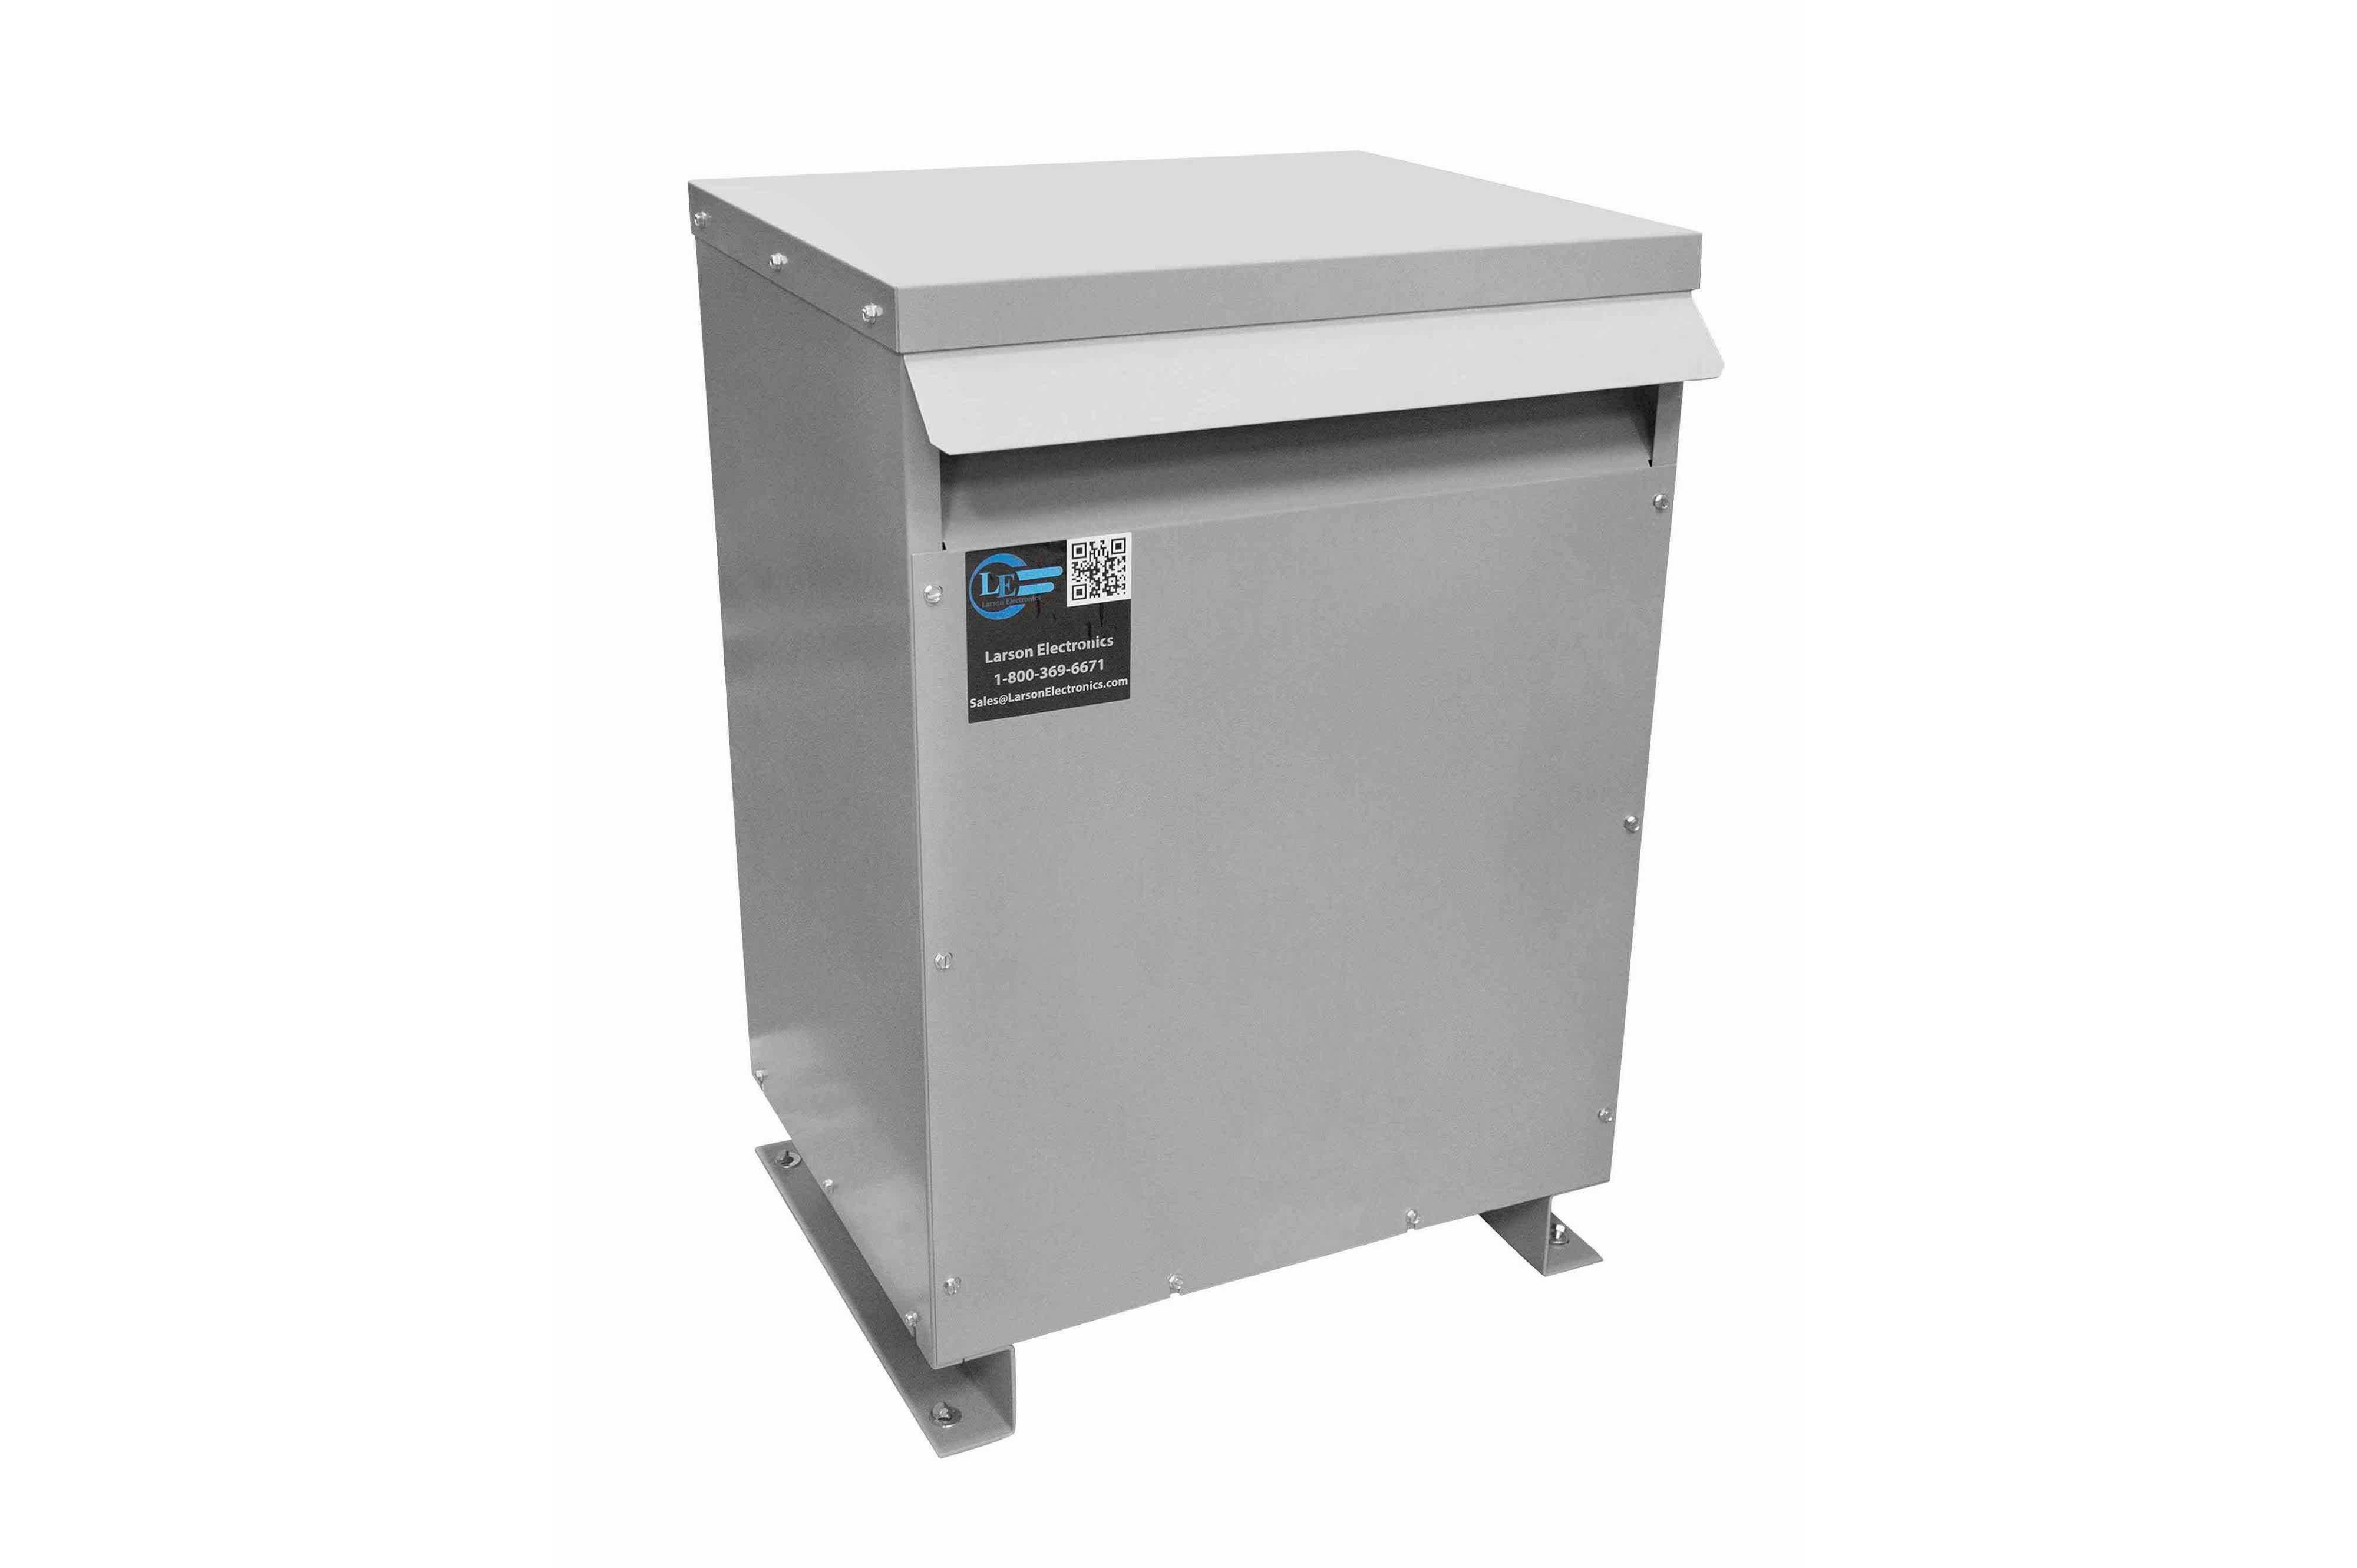 11 kVA 3PH Isolation Transformer, 480V Wye Primary, 208Y/120 Wye-N Secondary, N3R, Ventilated, 60 Hz